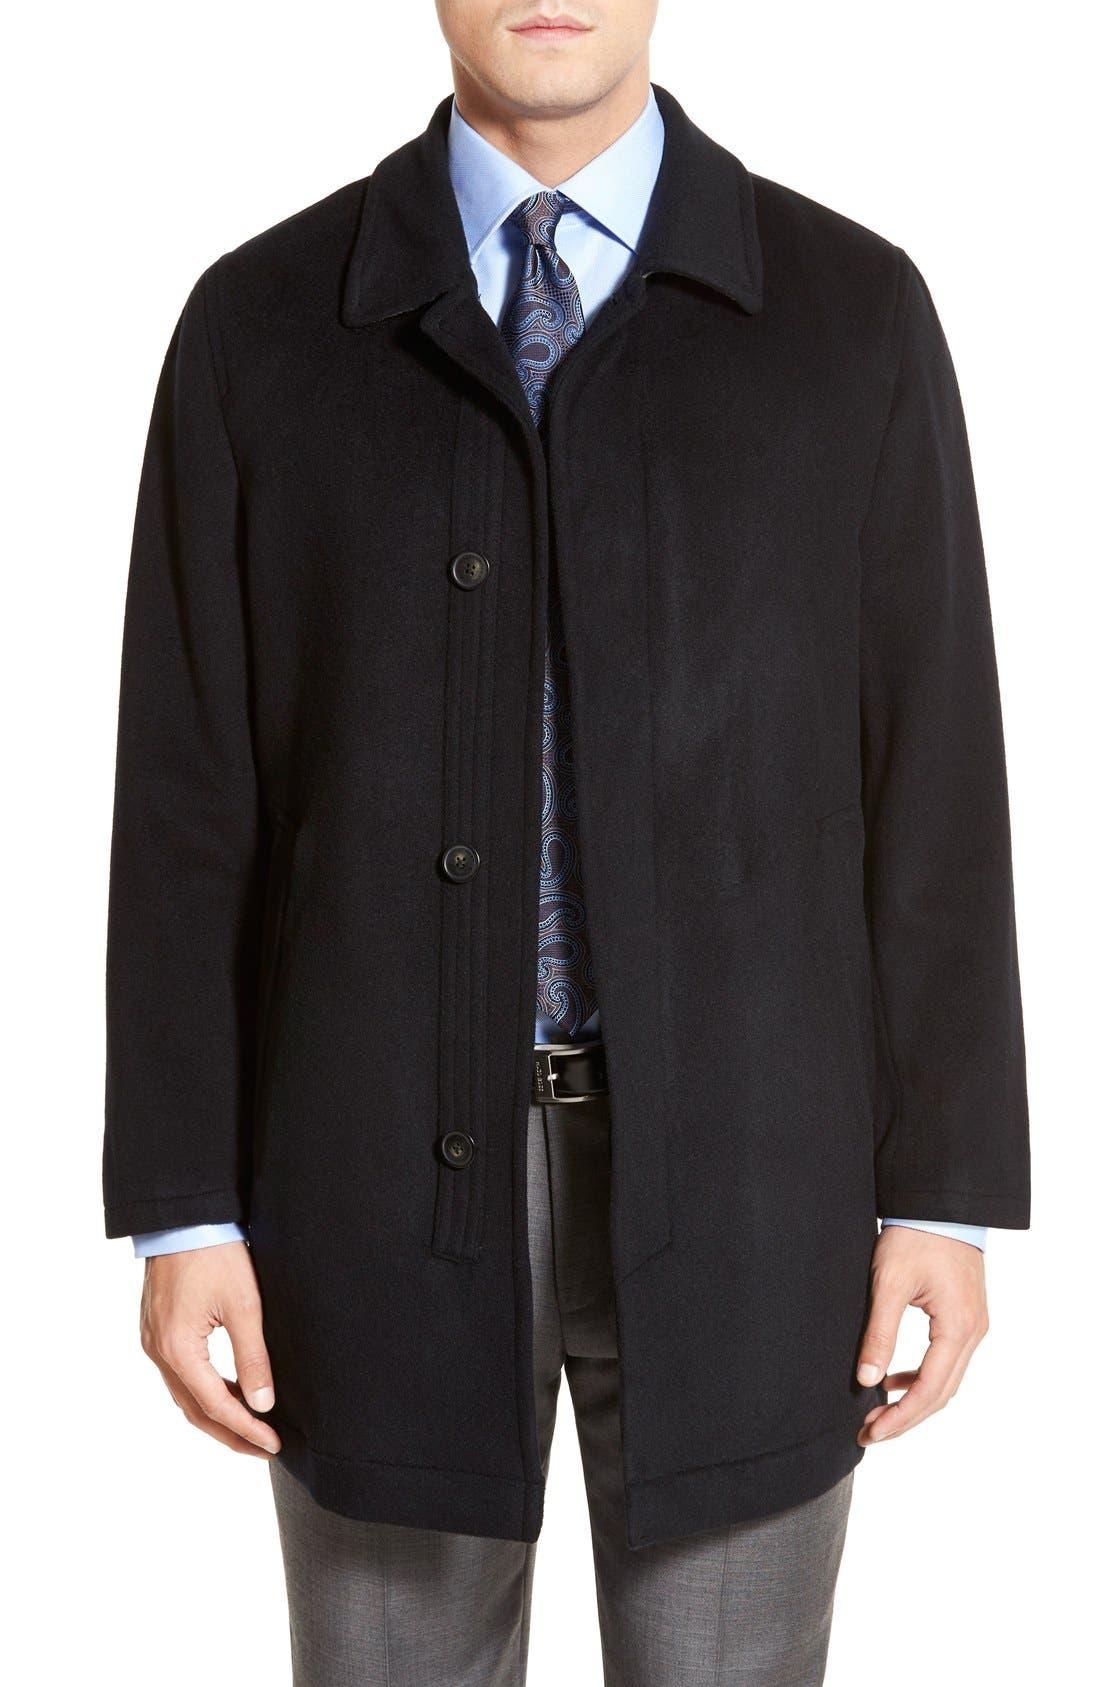 Douglas Modern Fit Wool & Cashmere Overcoat,                         Main,                         color,